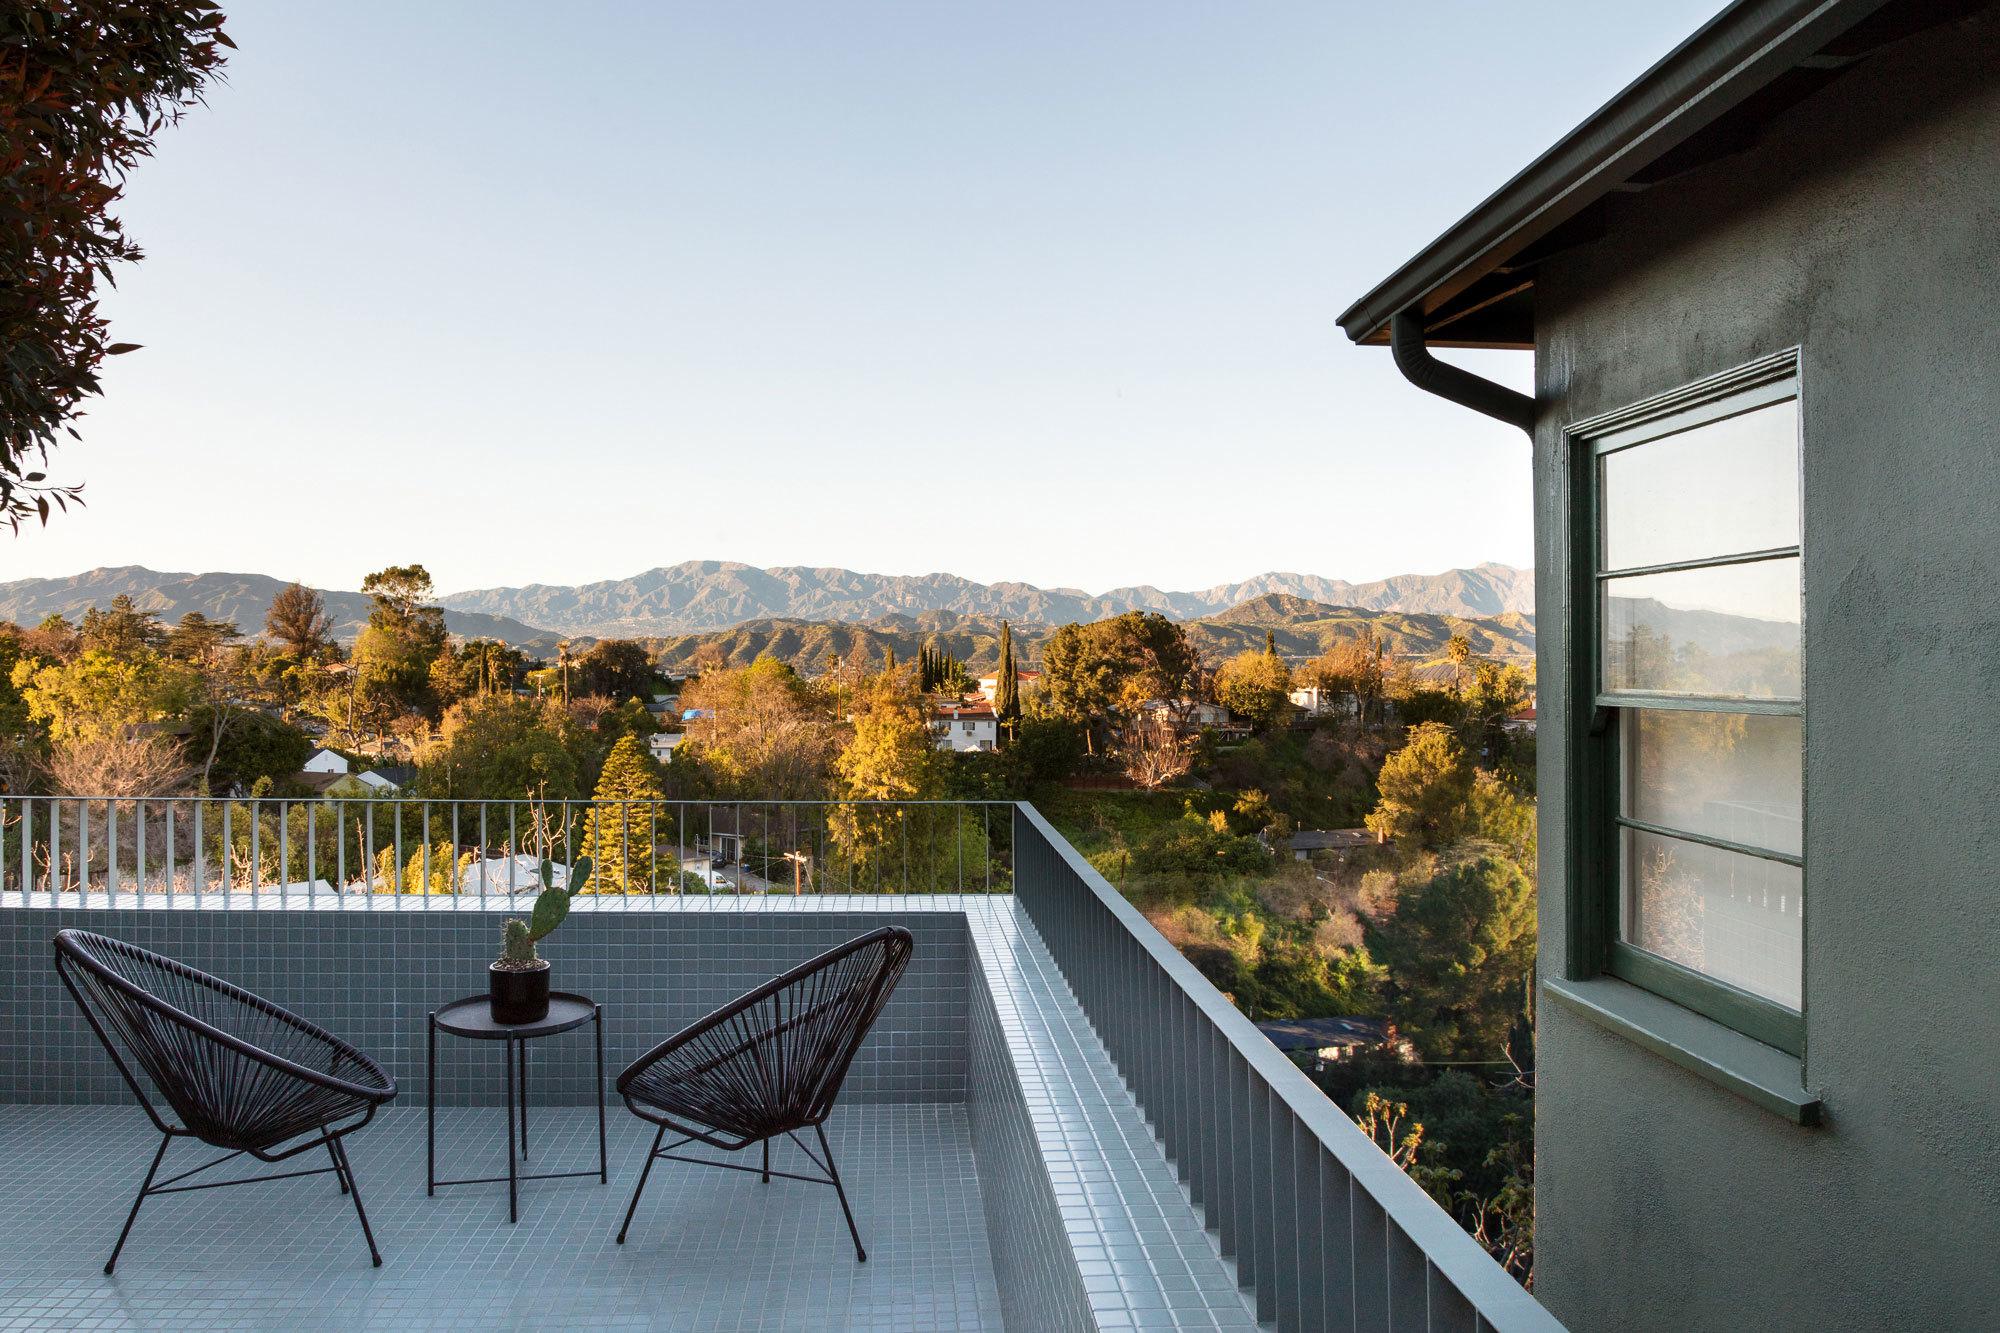 Mount Washington Studio, Los Angeles, 2017-19, Foto: Brica Wilcox